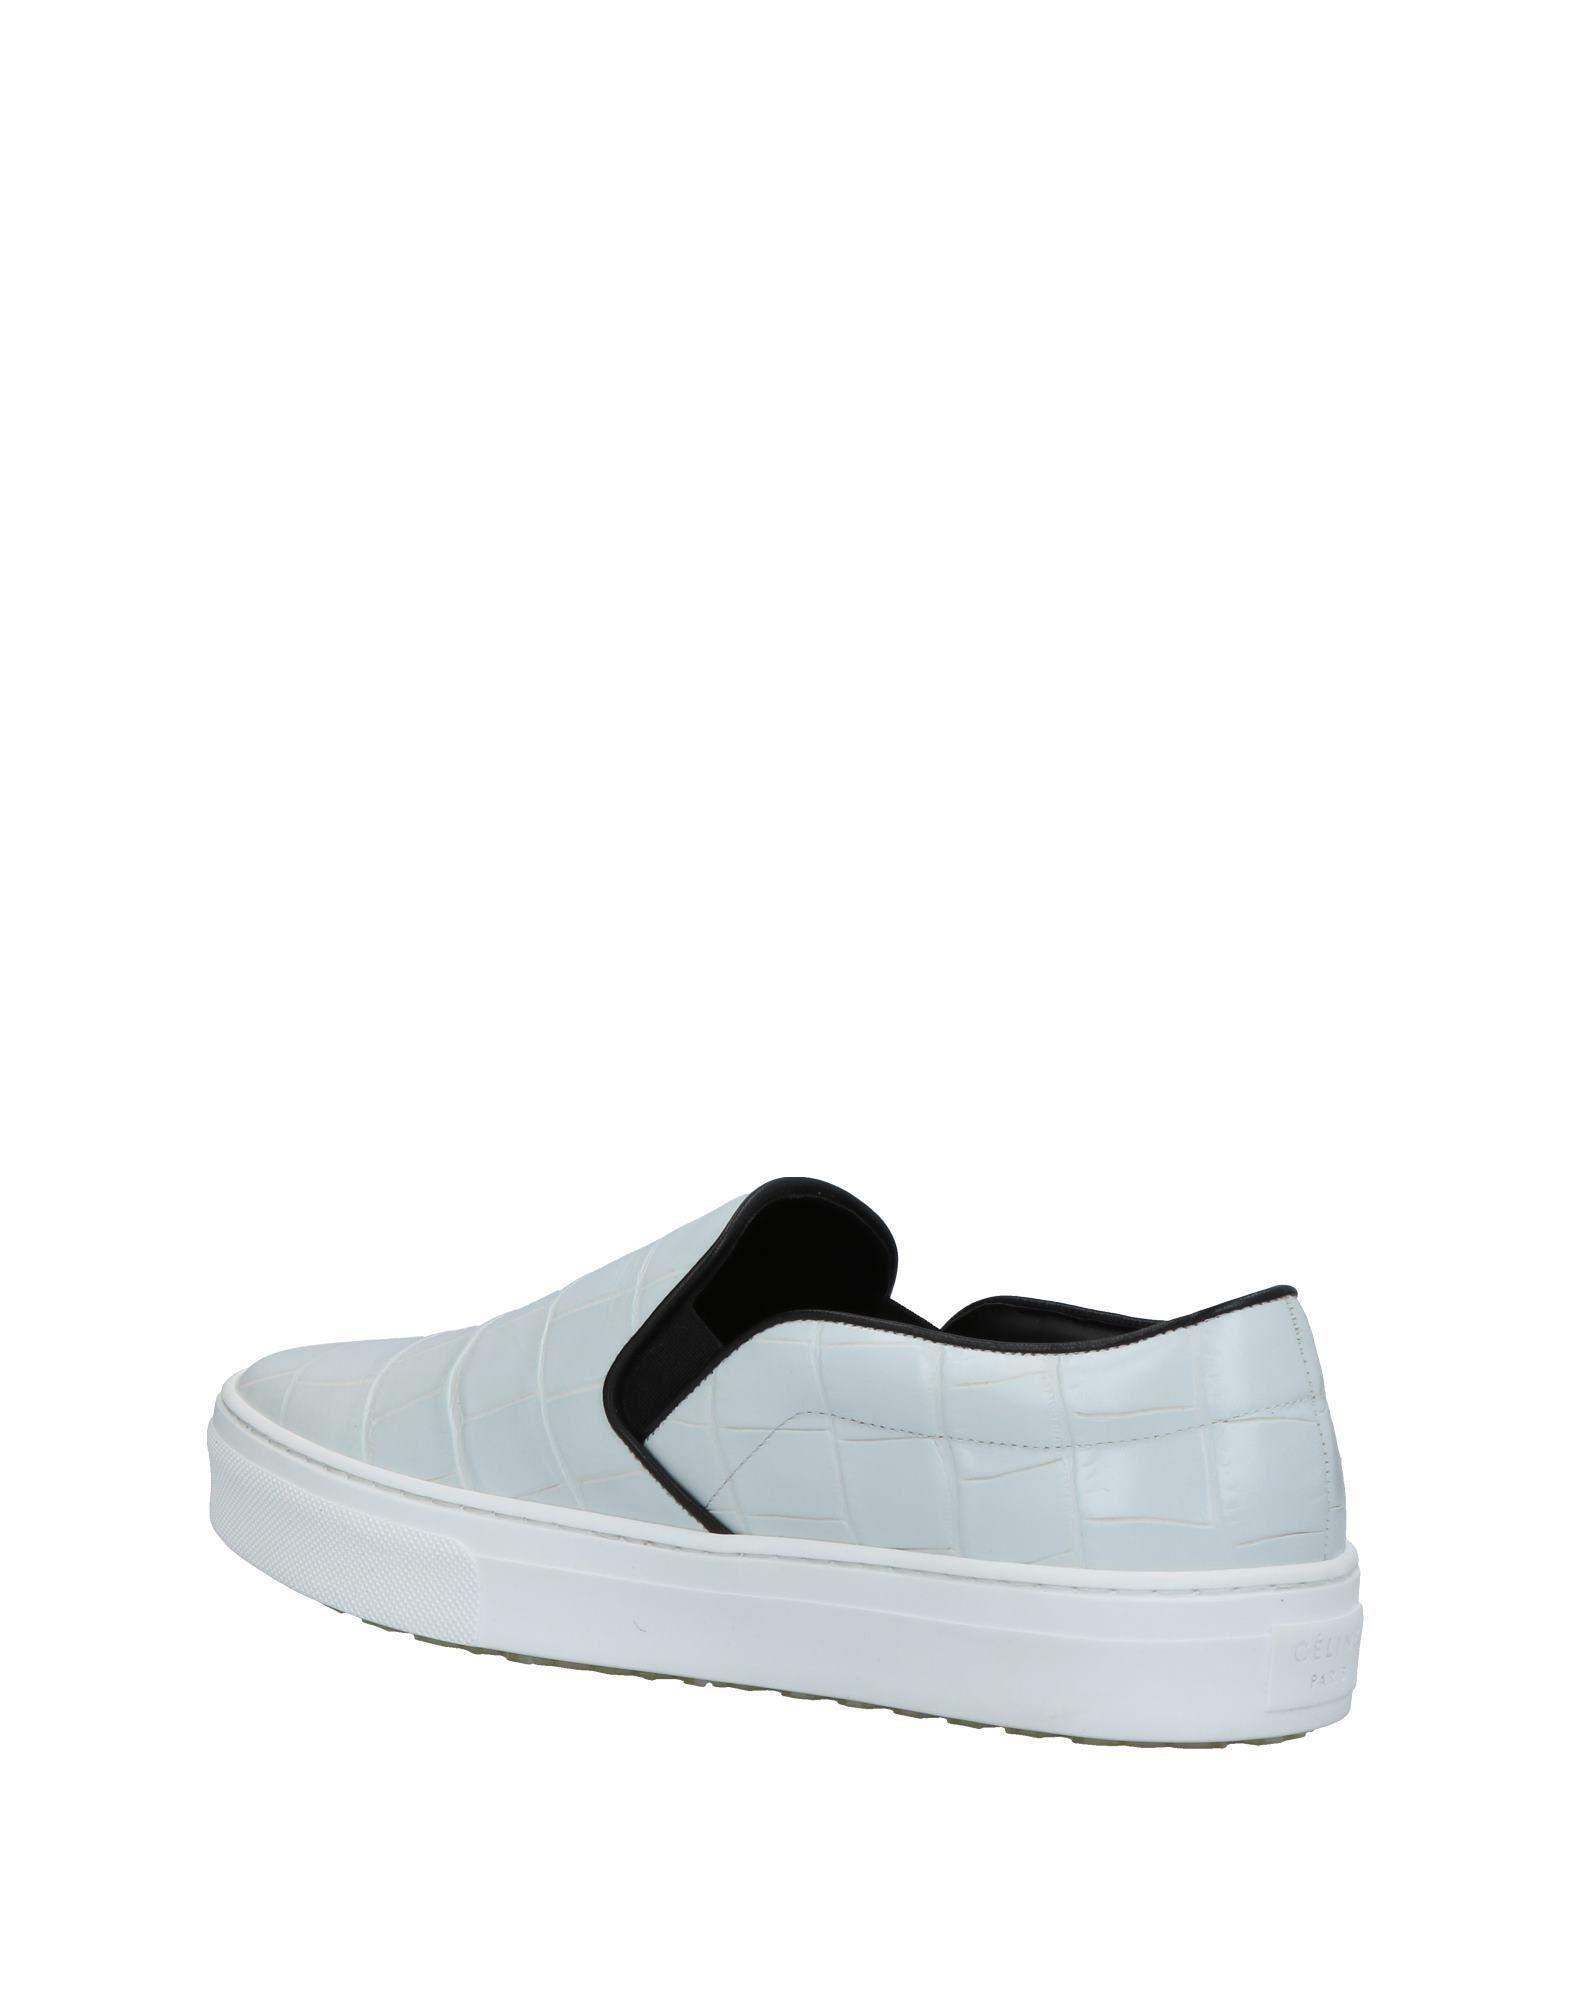 Celine Leather Low-tops & Sneakers in Light Grey (Grey)